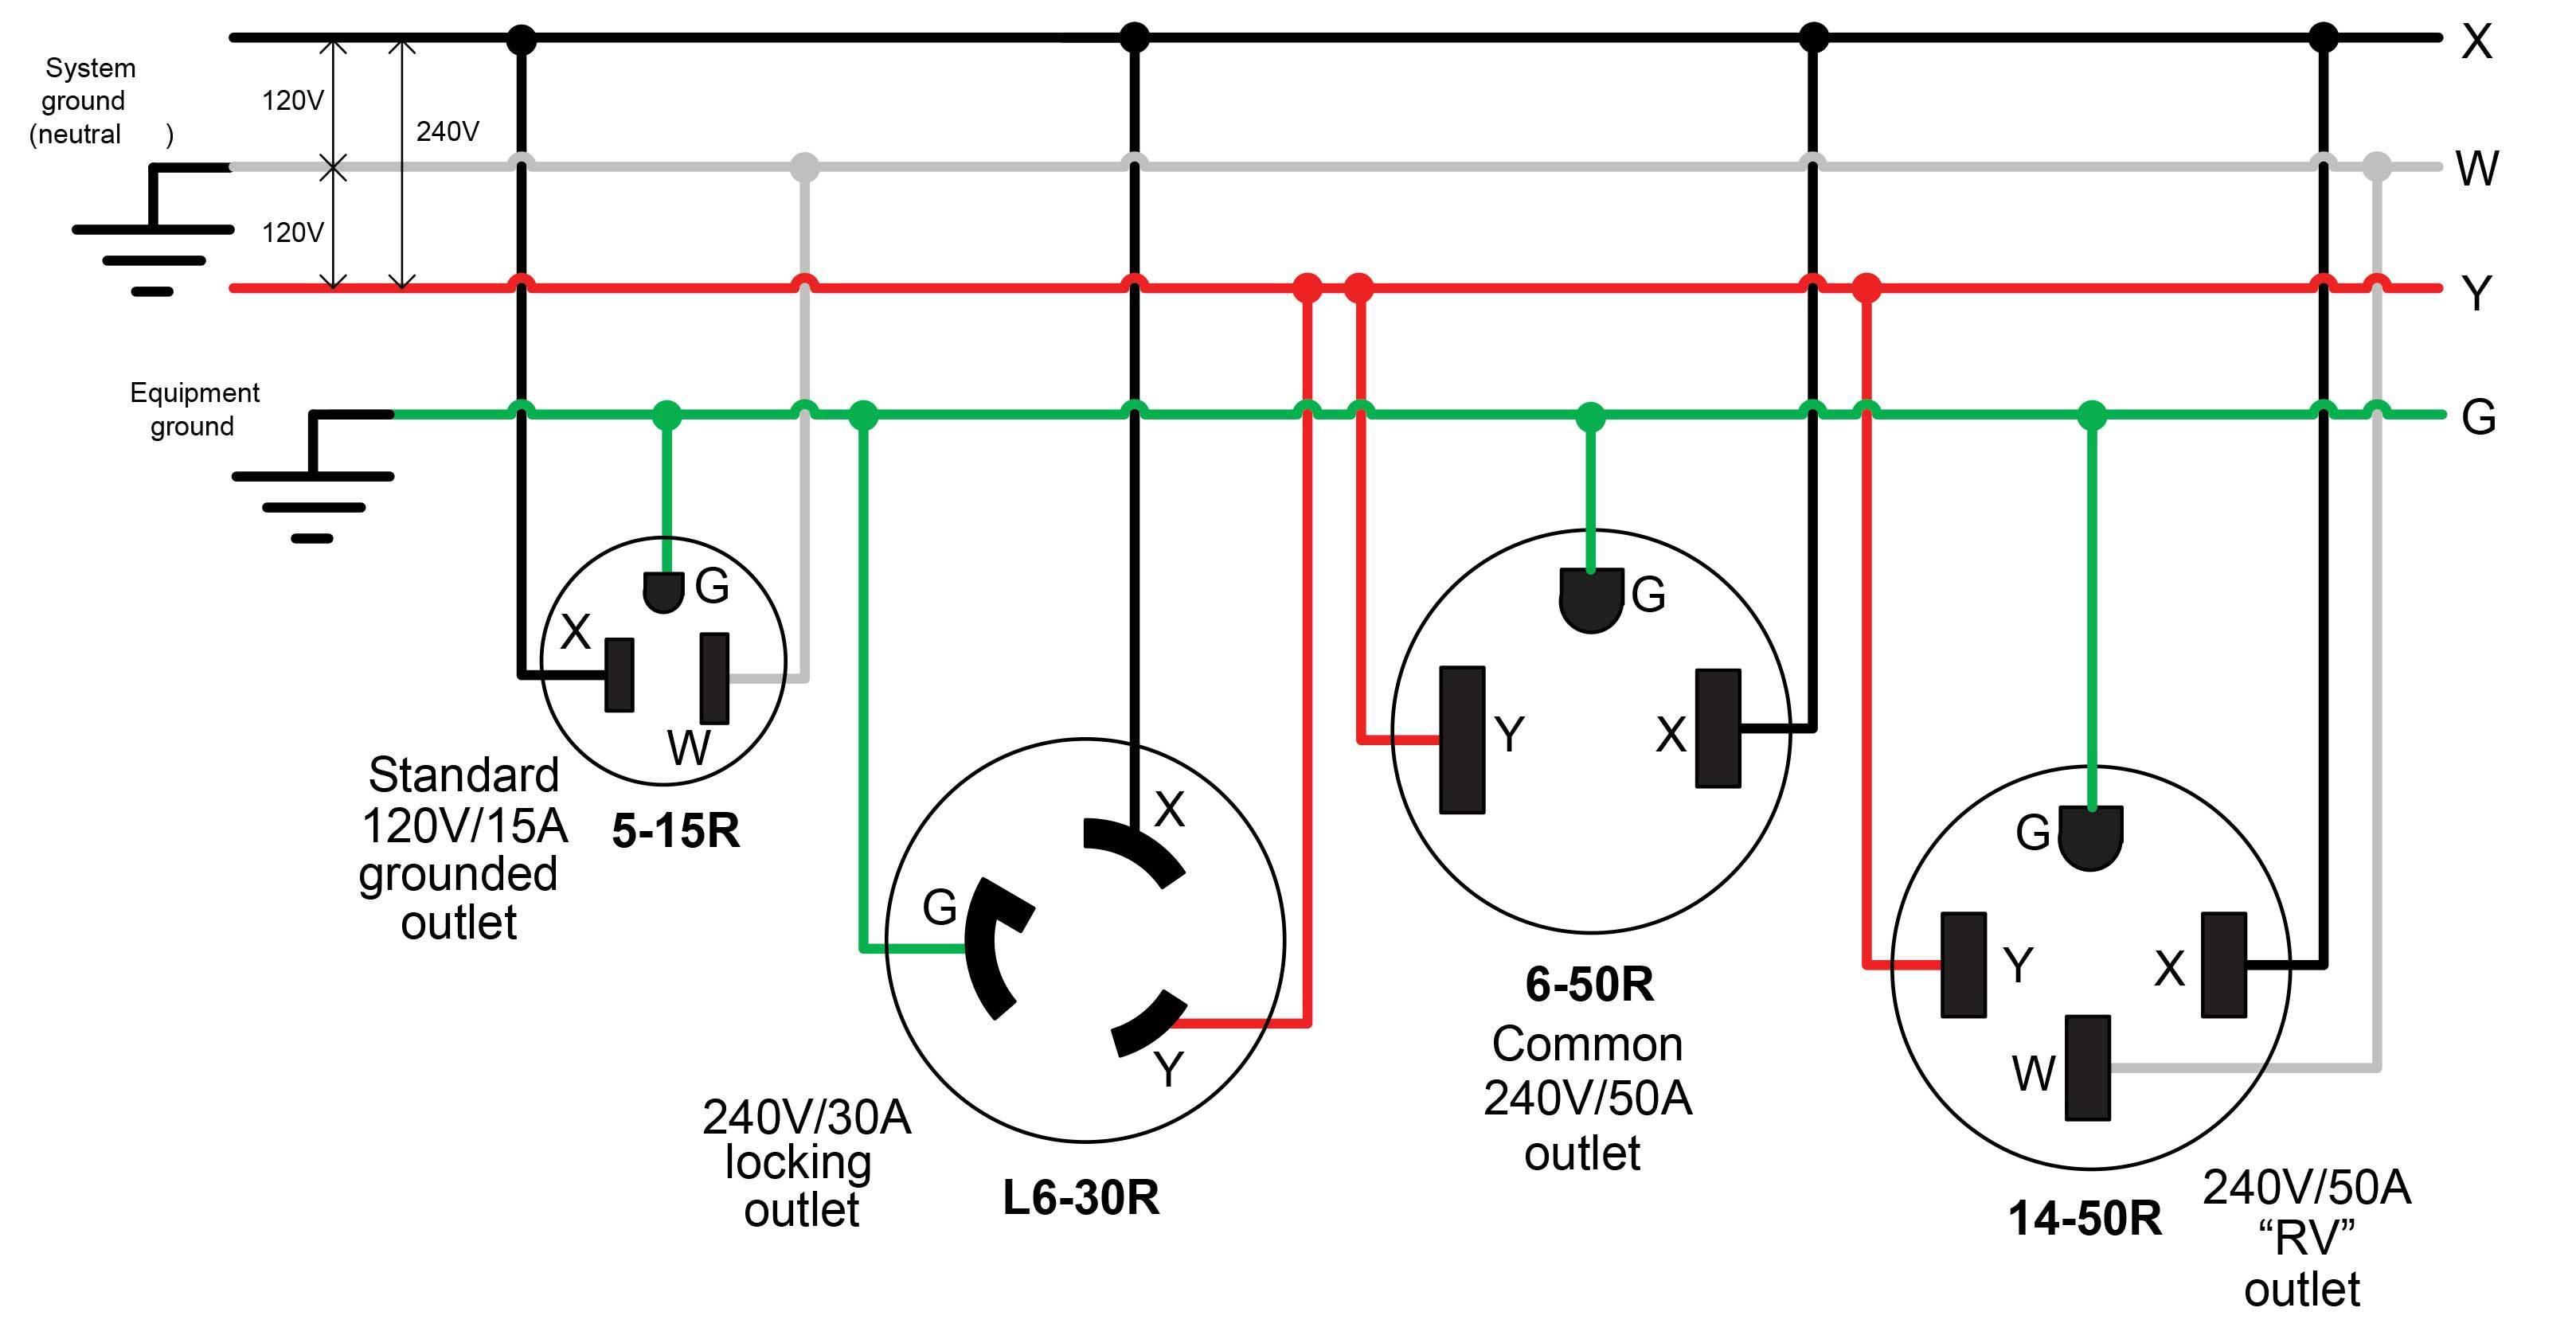 50 Amp To 30 Amp Wiring Diagram | Manual E-Books - 50 Amp Plug Wiring Diagram